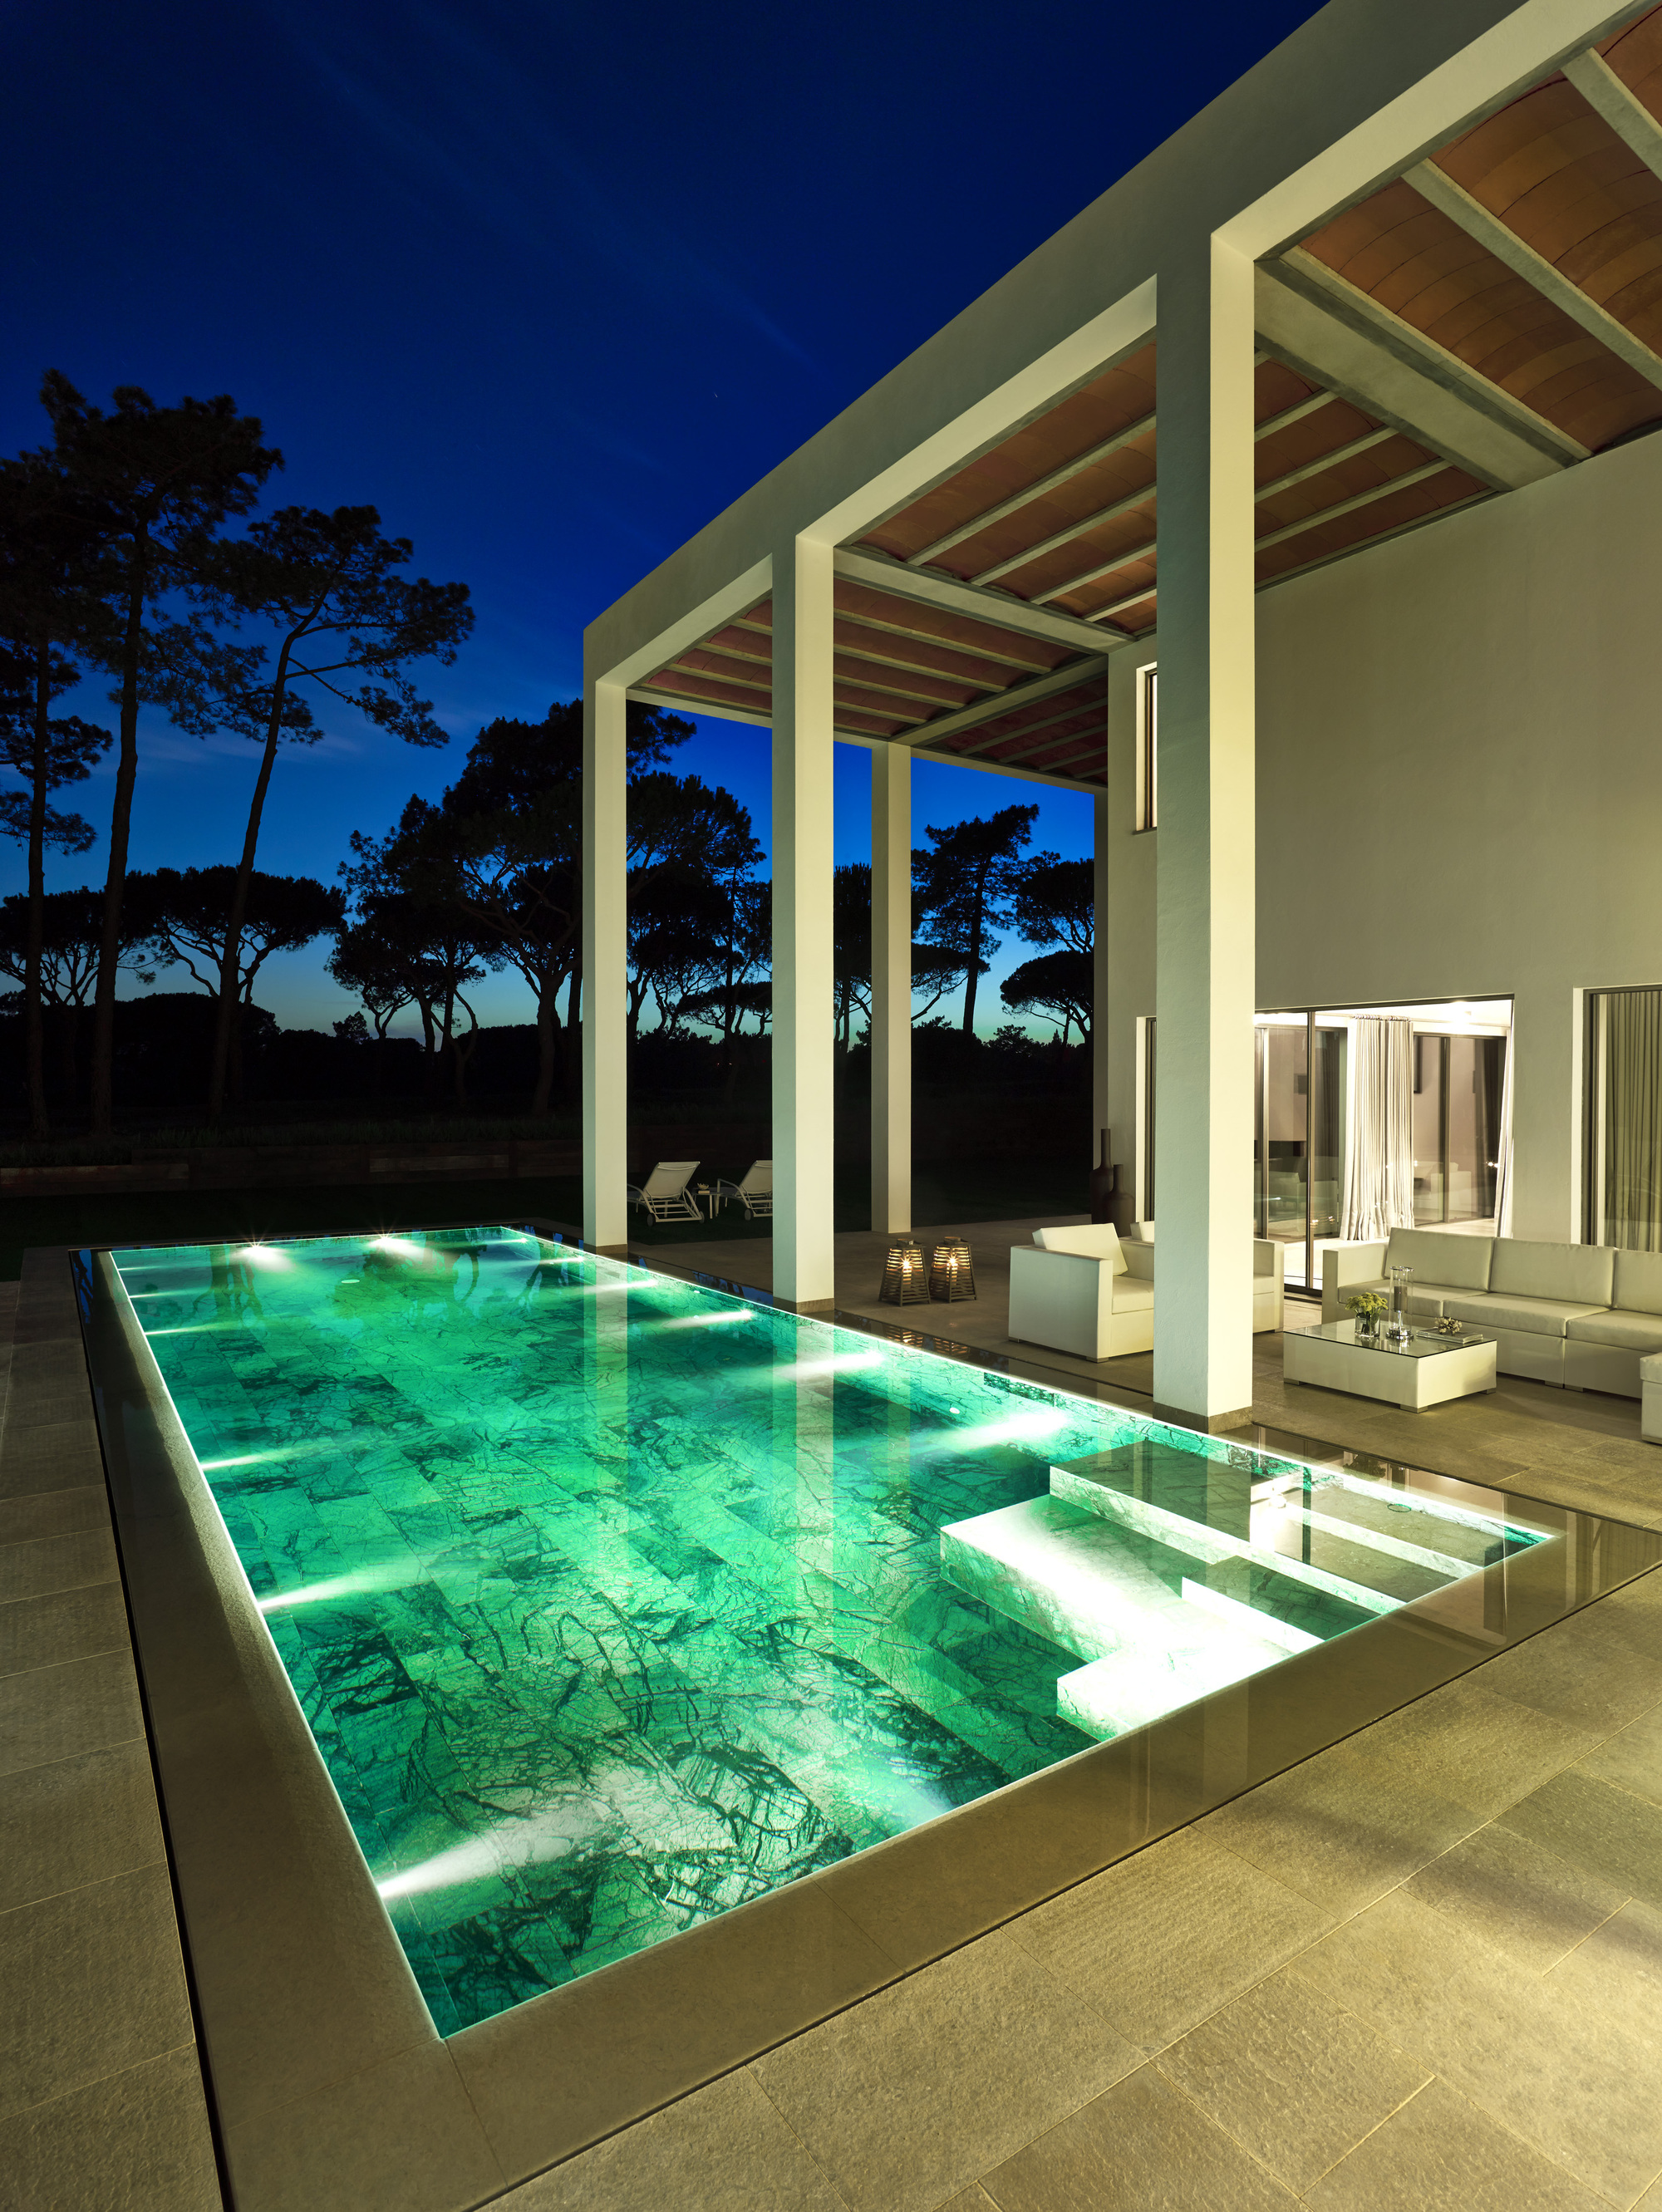 520a3859e8e44e420d000054_san-lorenzo-house-de-blacam-and-meagher-architects_sln_6.jpg